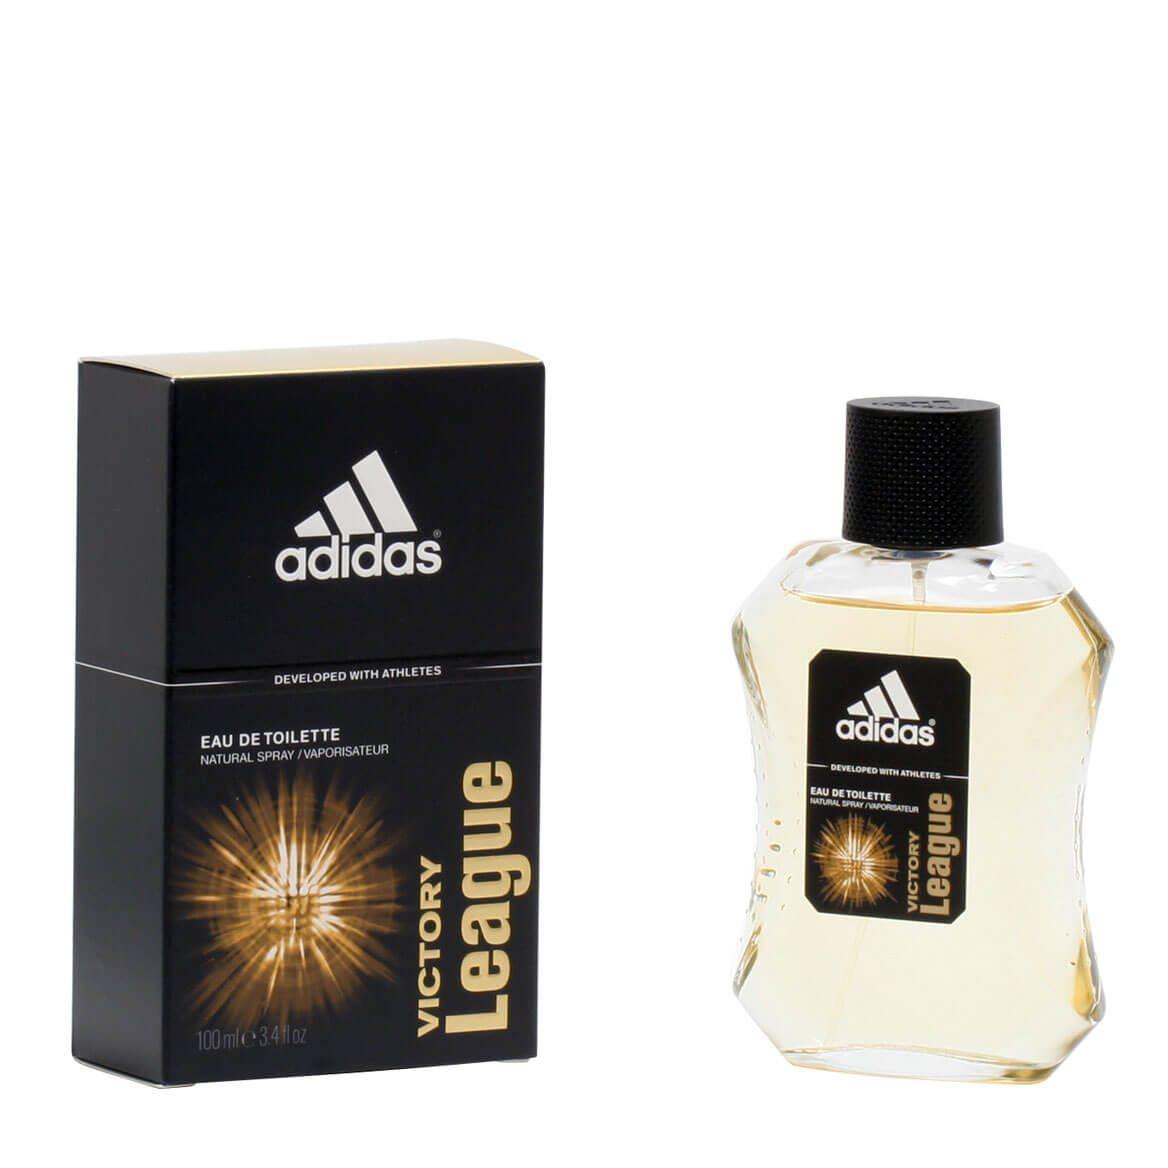 Adidas Victory League Men, EDT Spray 3.4oz-360281